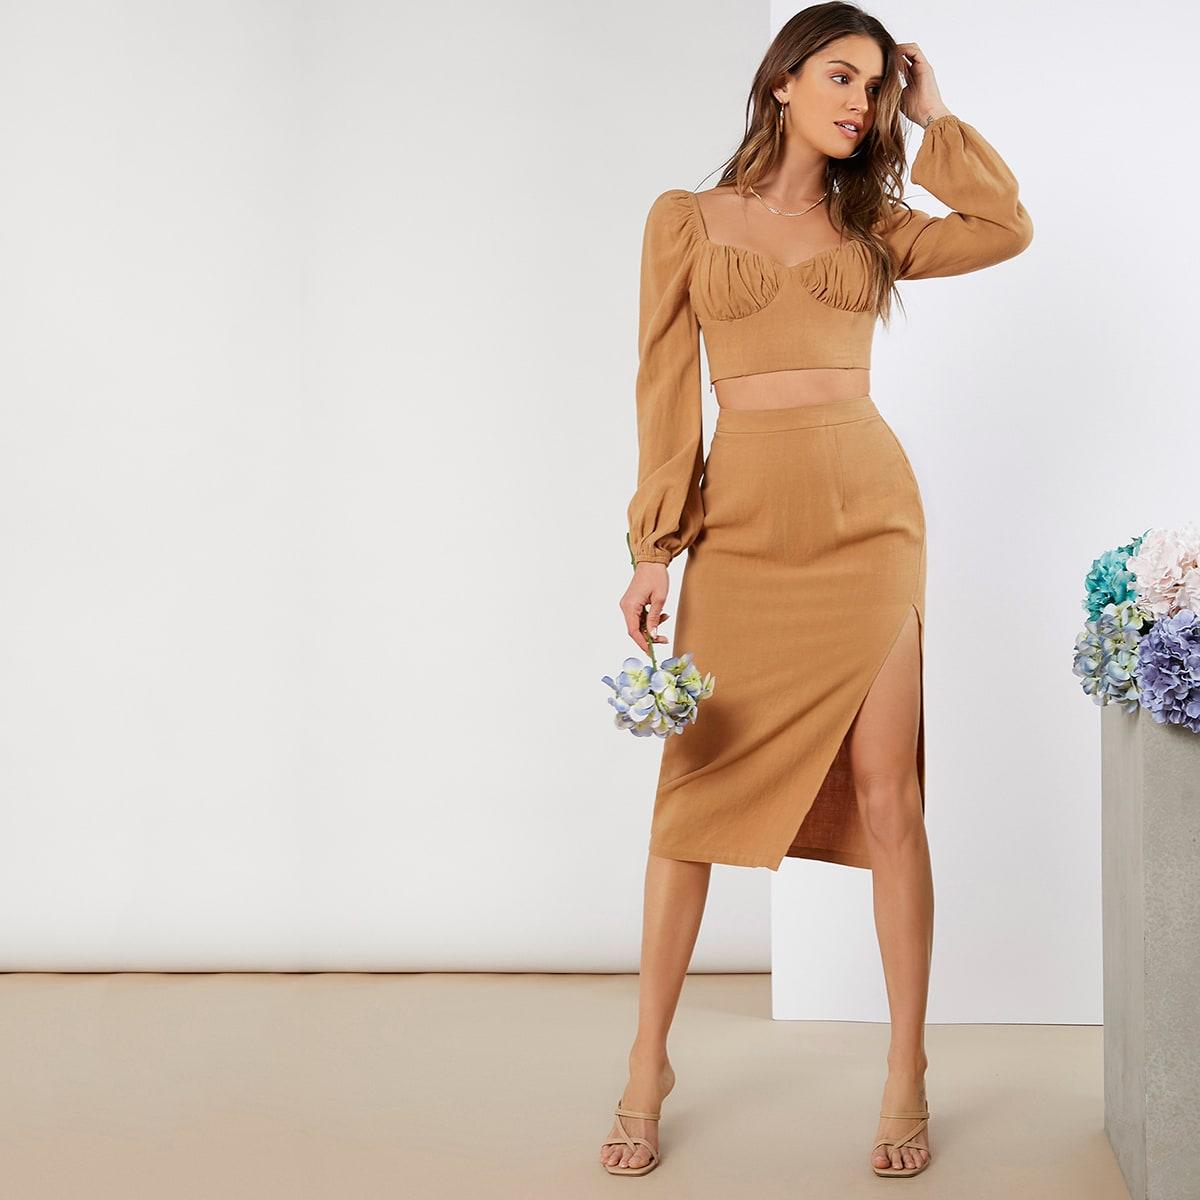 SHEIN / Lantern Sleeve Ruched Bust Top & Split Thigh Skirt Set